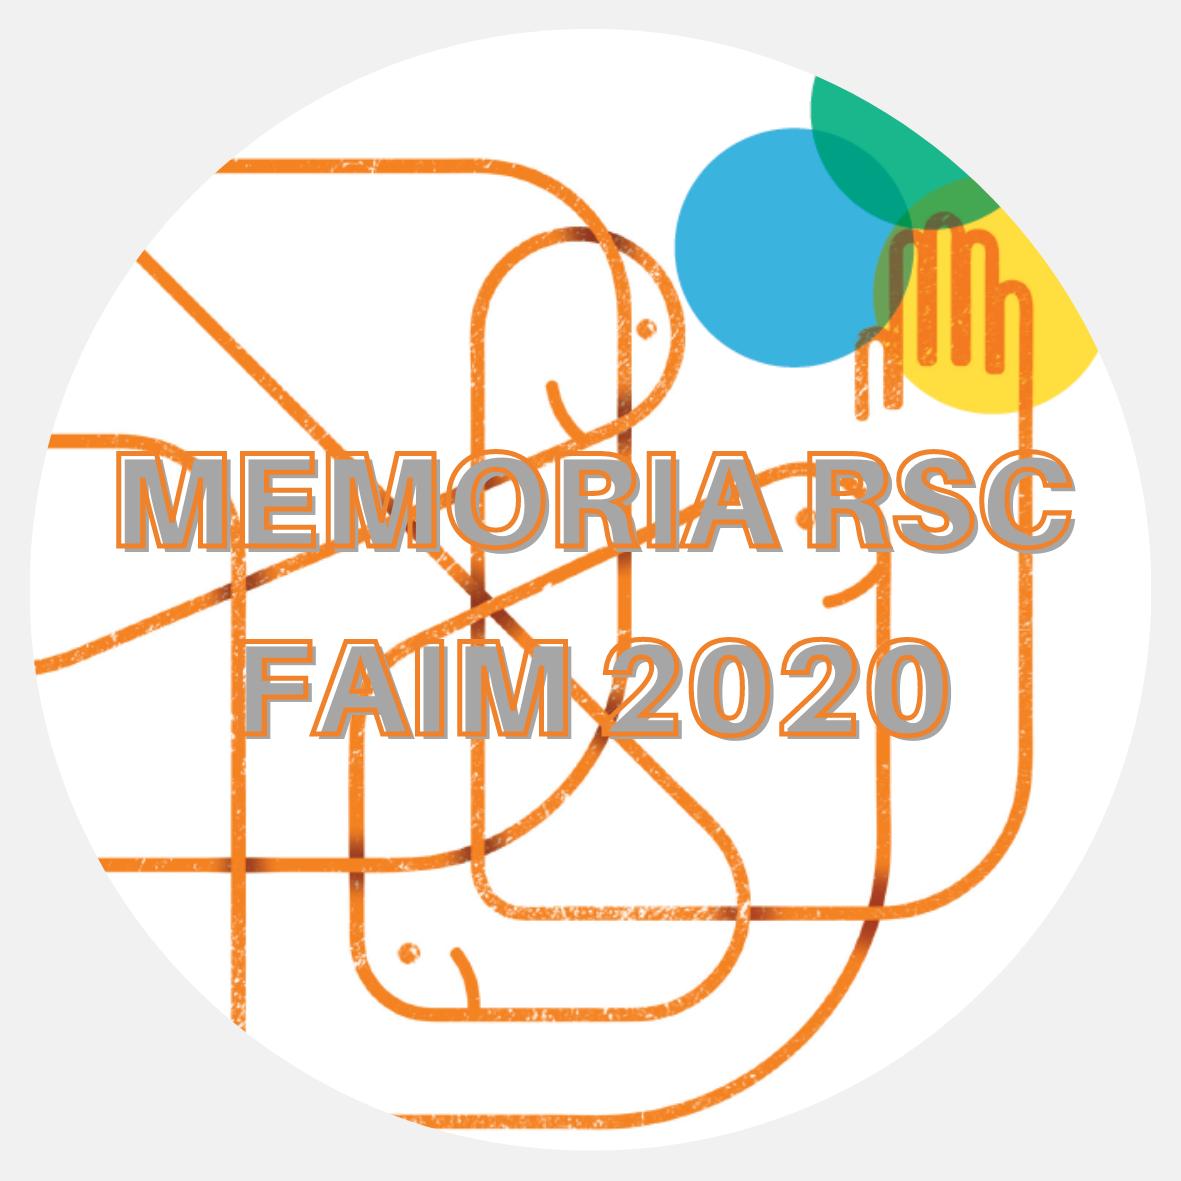 memoria rsc 2020